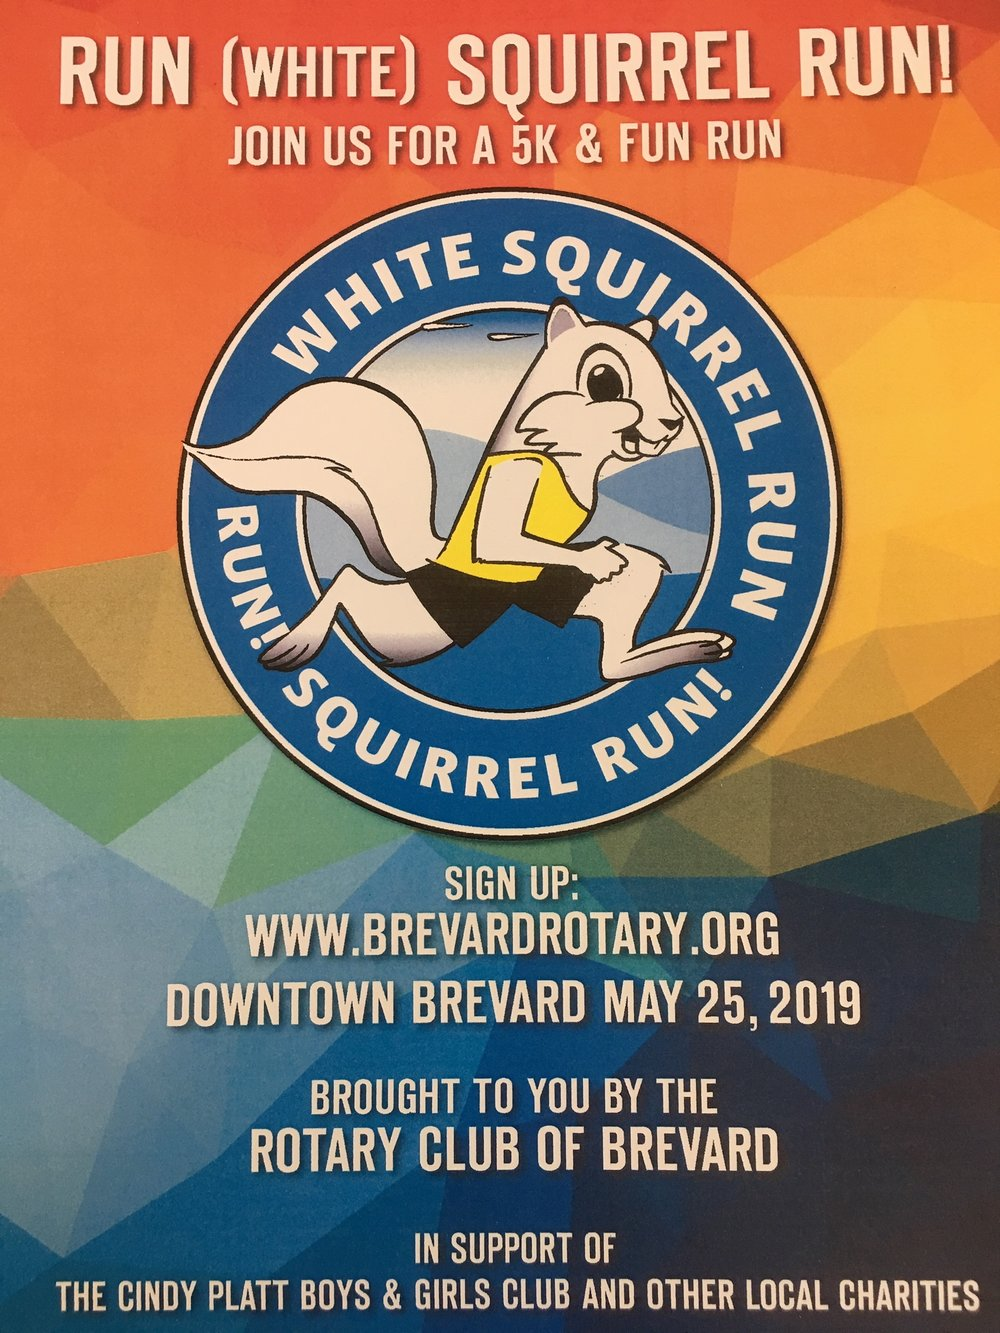 White squirrel run poster.JPG